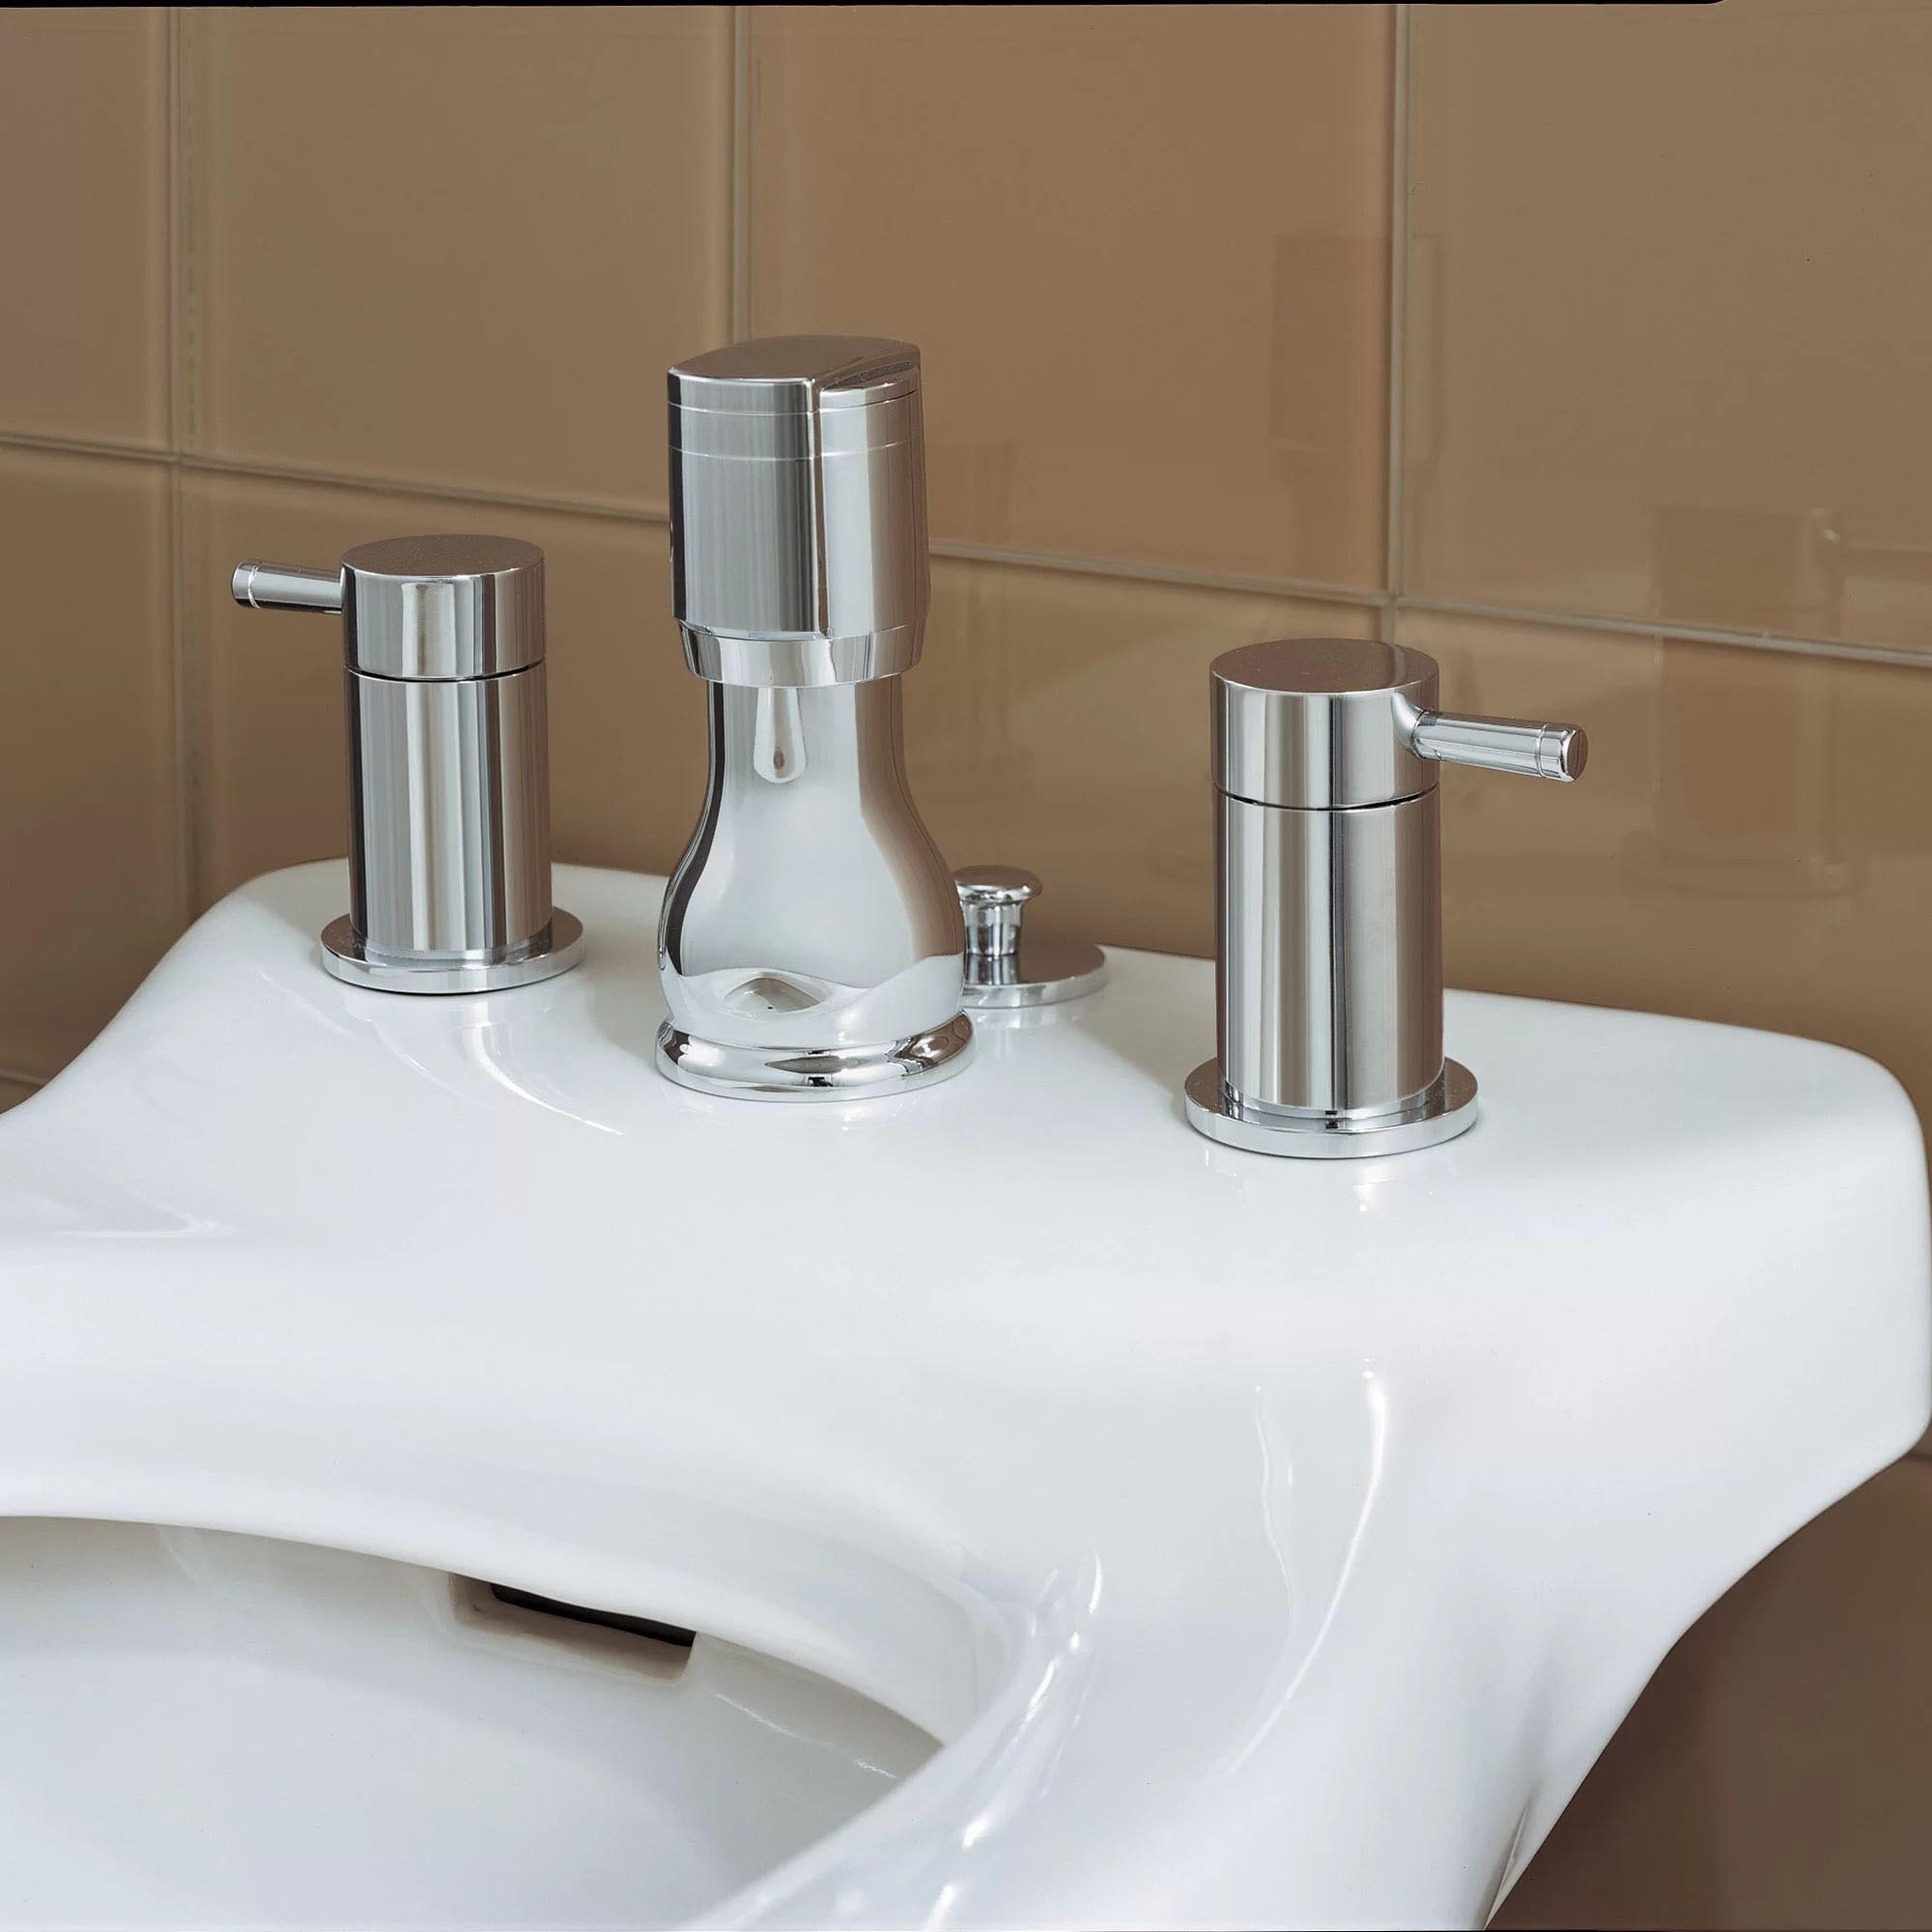 serin widespread vertical bidet faucet